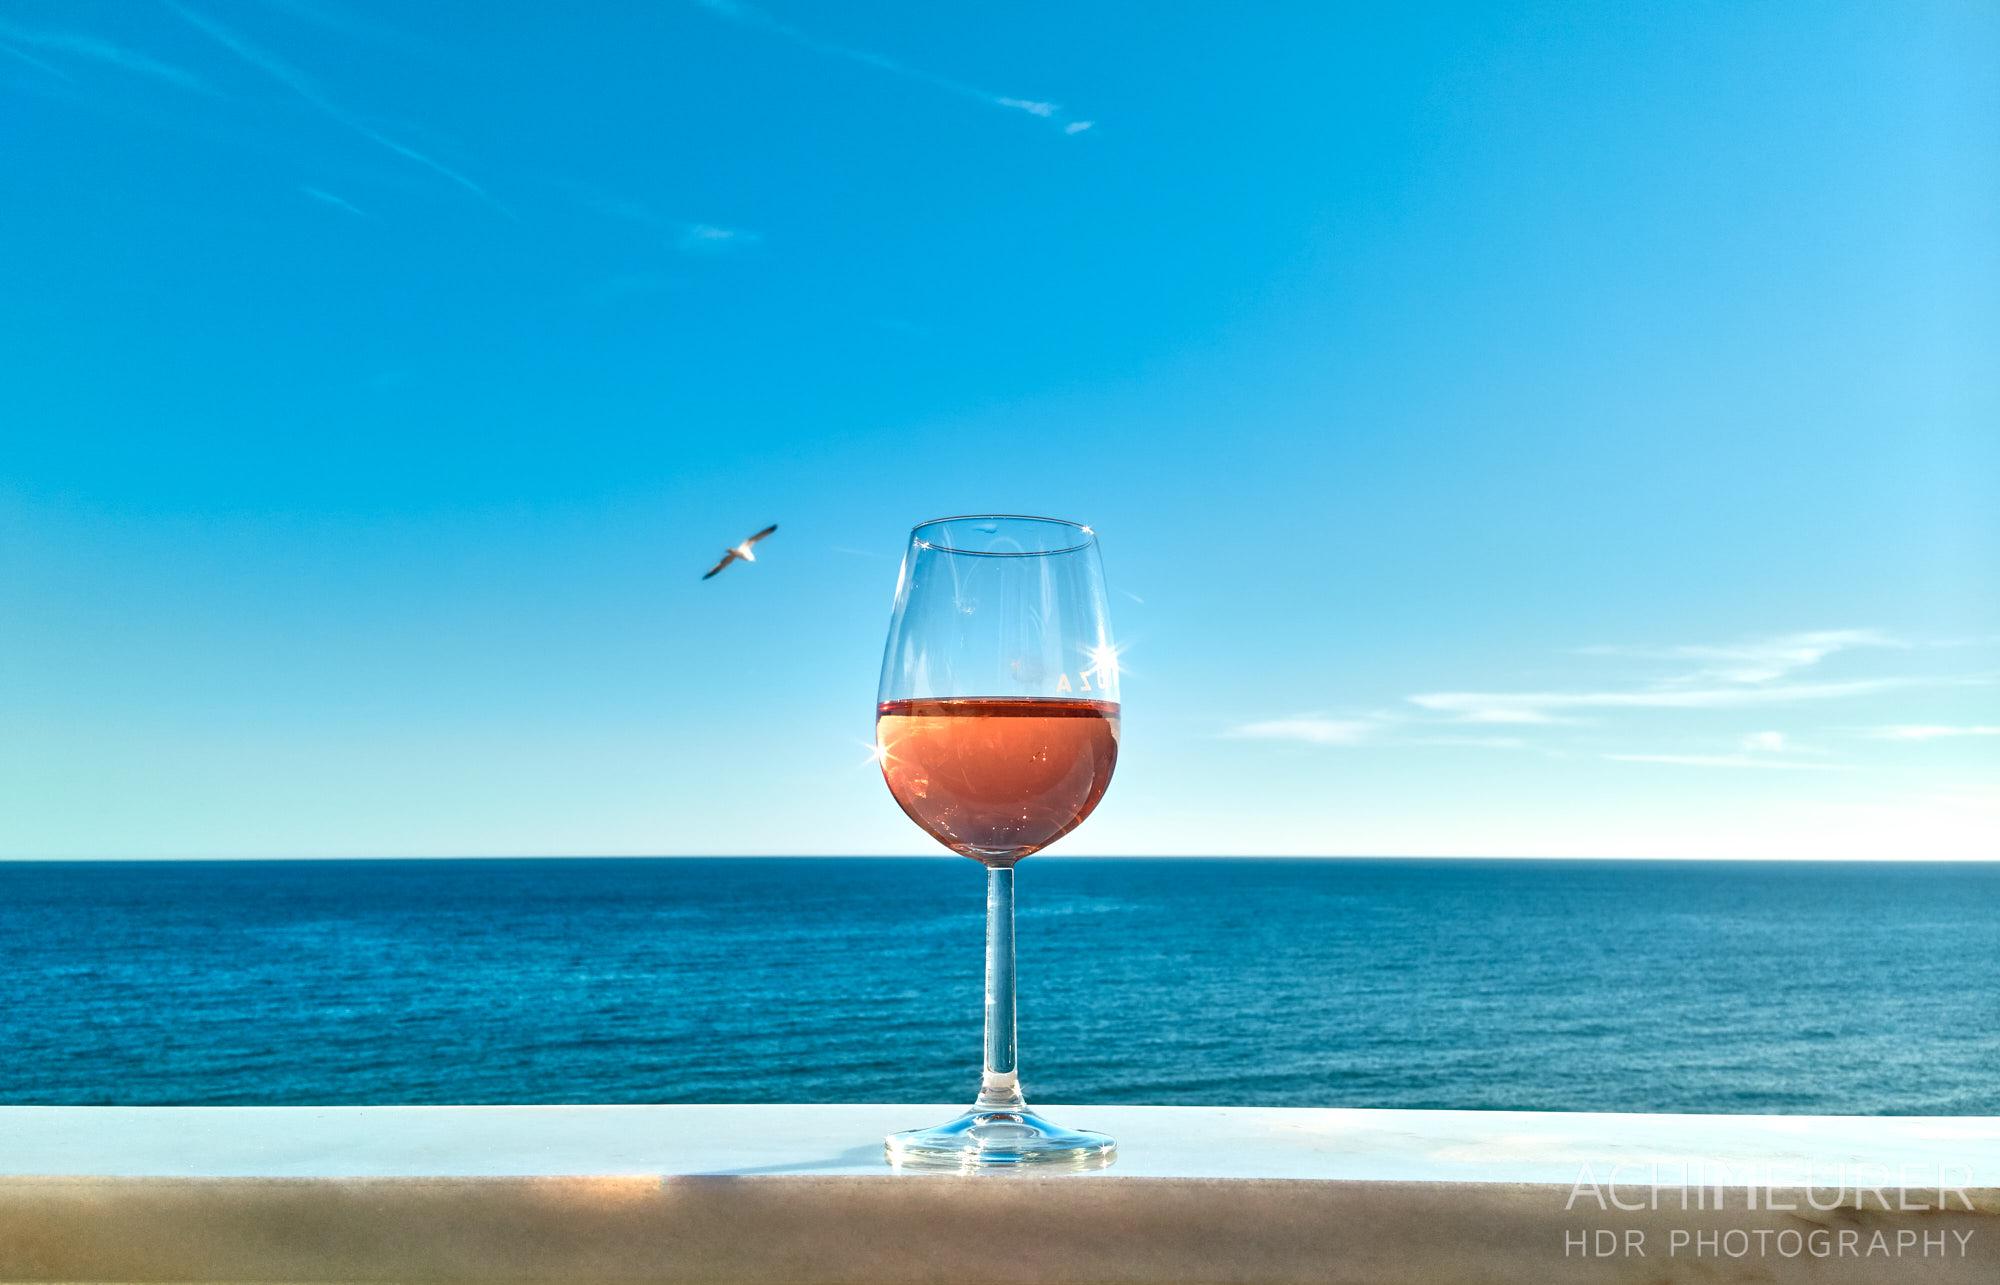 Chillout mit Meerblick am Strand von Albufeira, Algarve, Portugal by Achim Meurer.